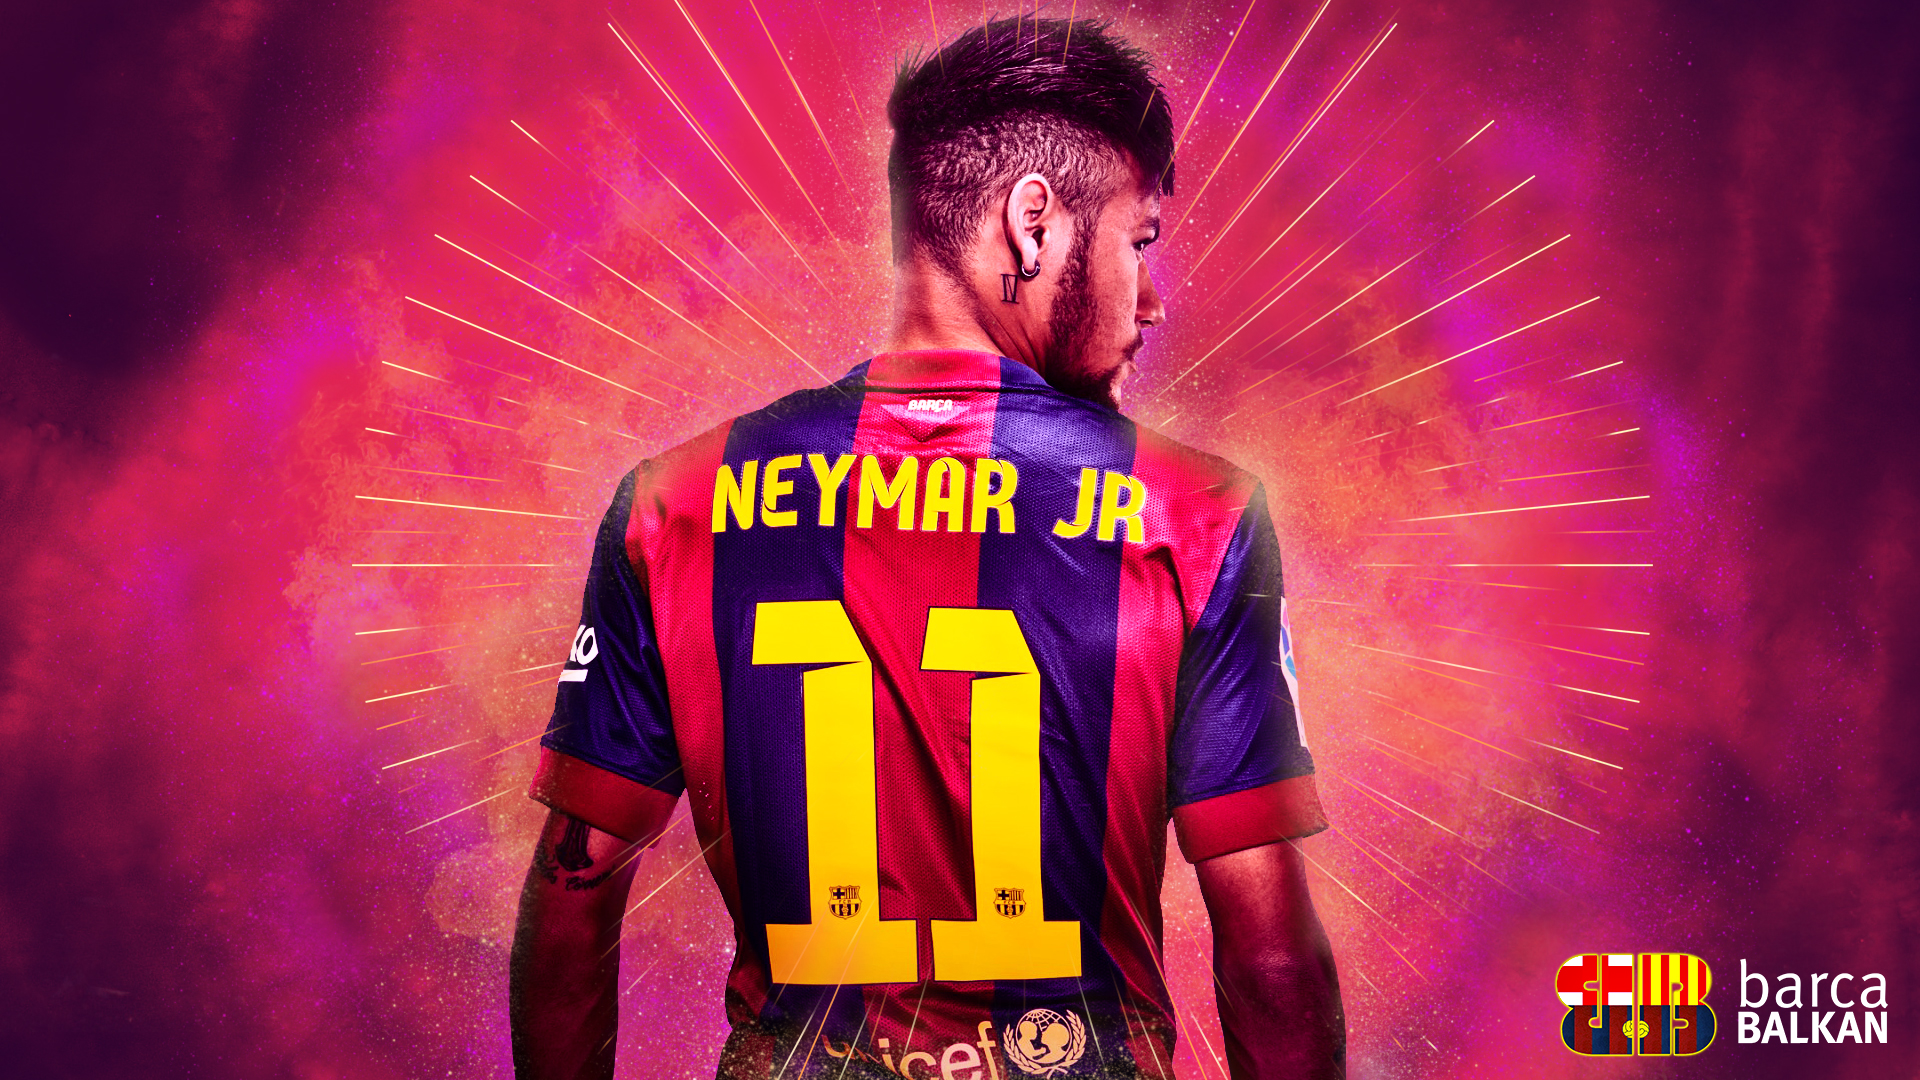 Hd wallpaper neymar - Neymar Full Hd Wallpaper 1920x1080